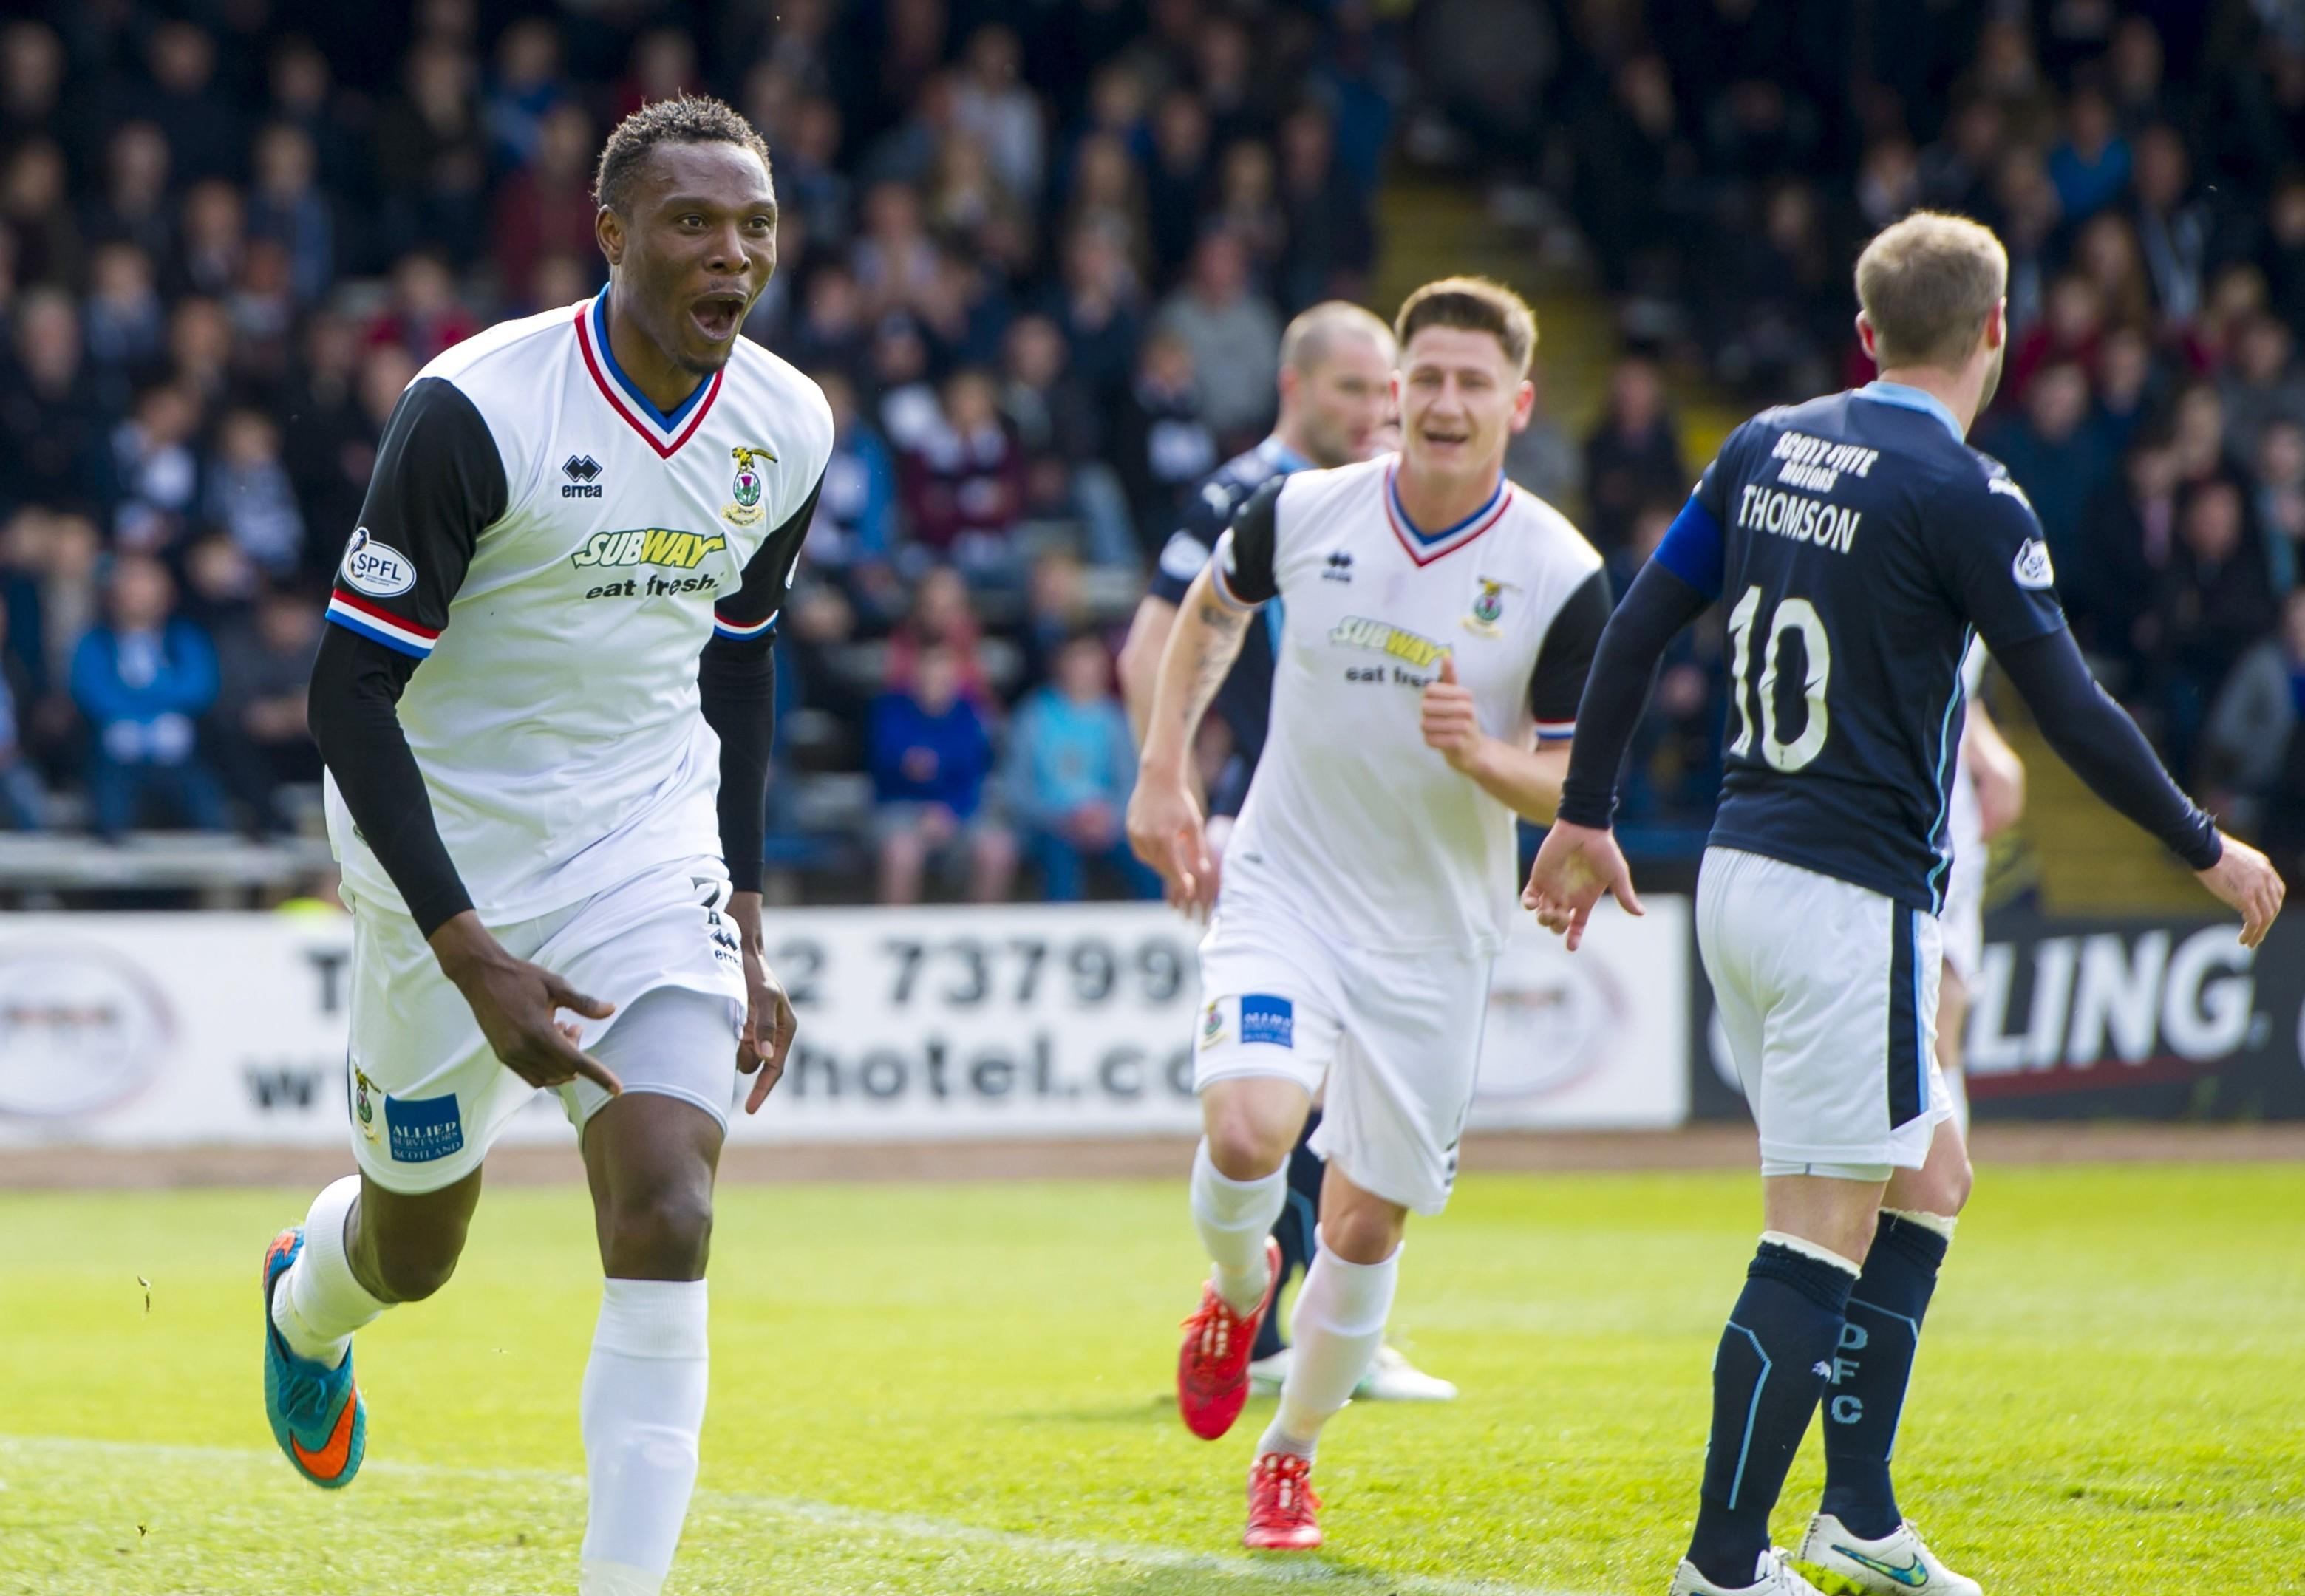 Edward Ofere celebrates a goal